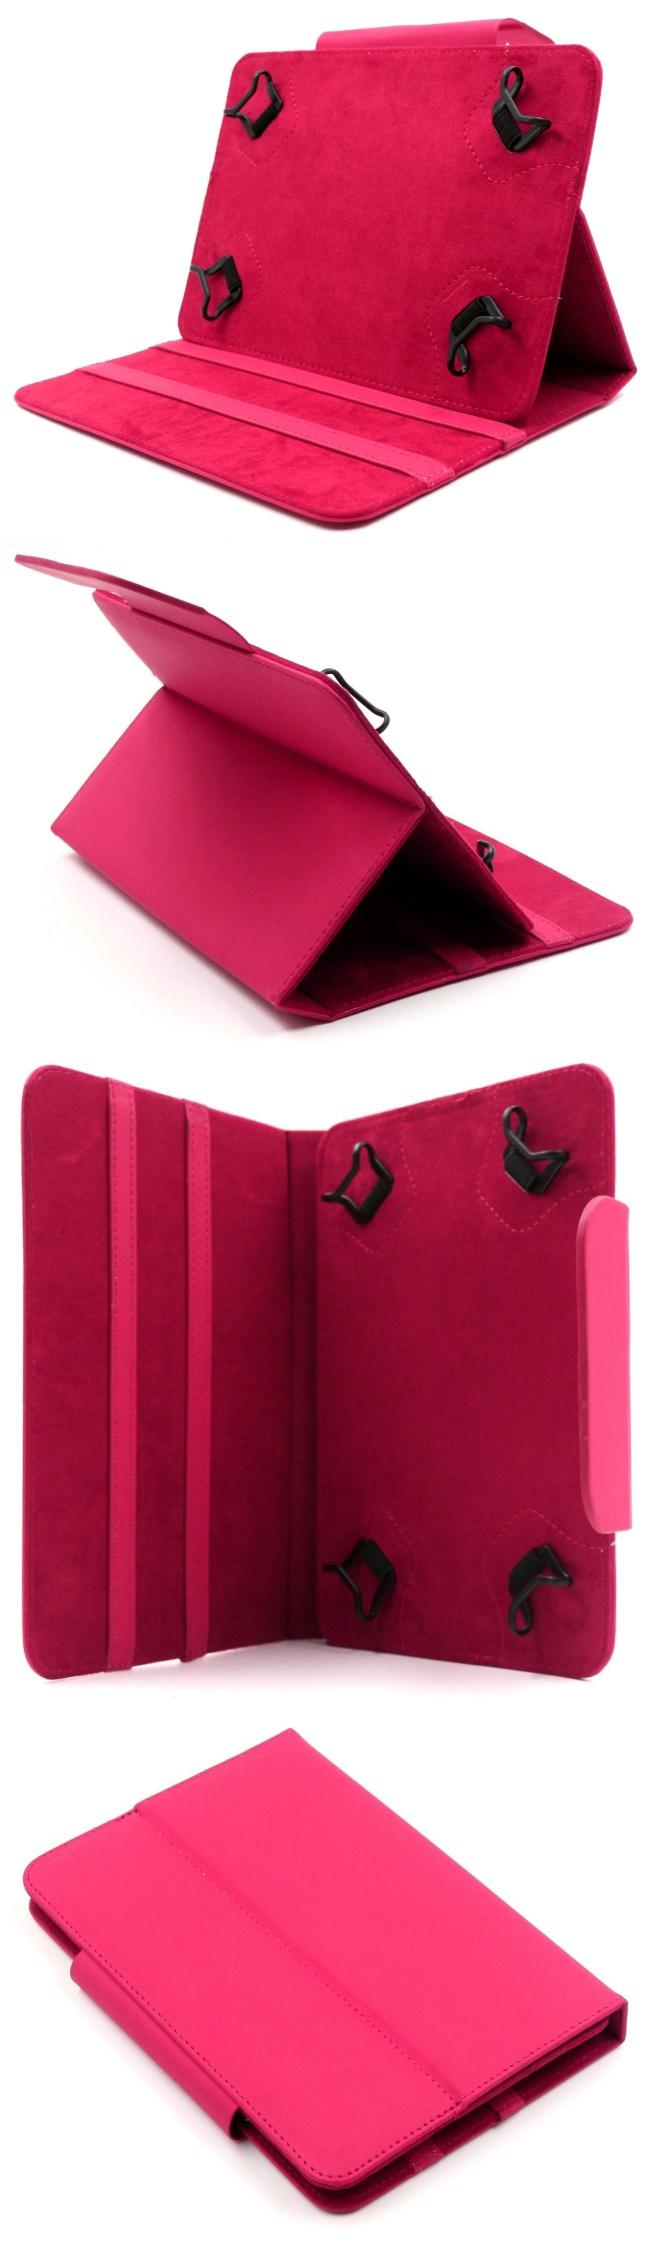 Pouzdro C-tech Protect pro Váš tablet, L, Black